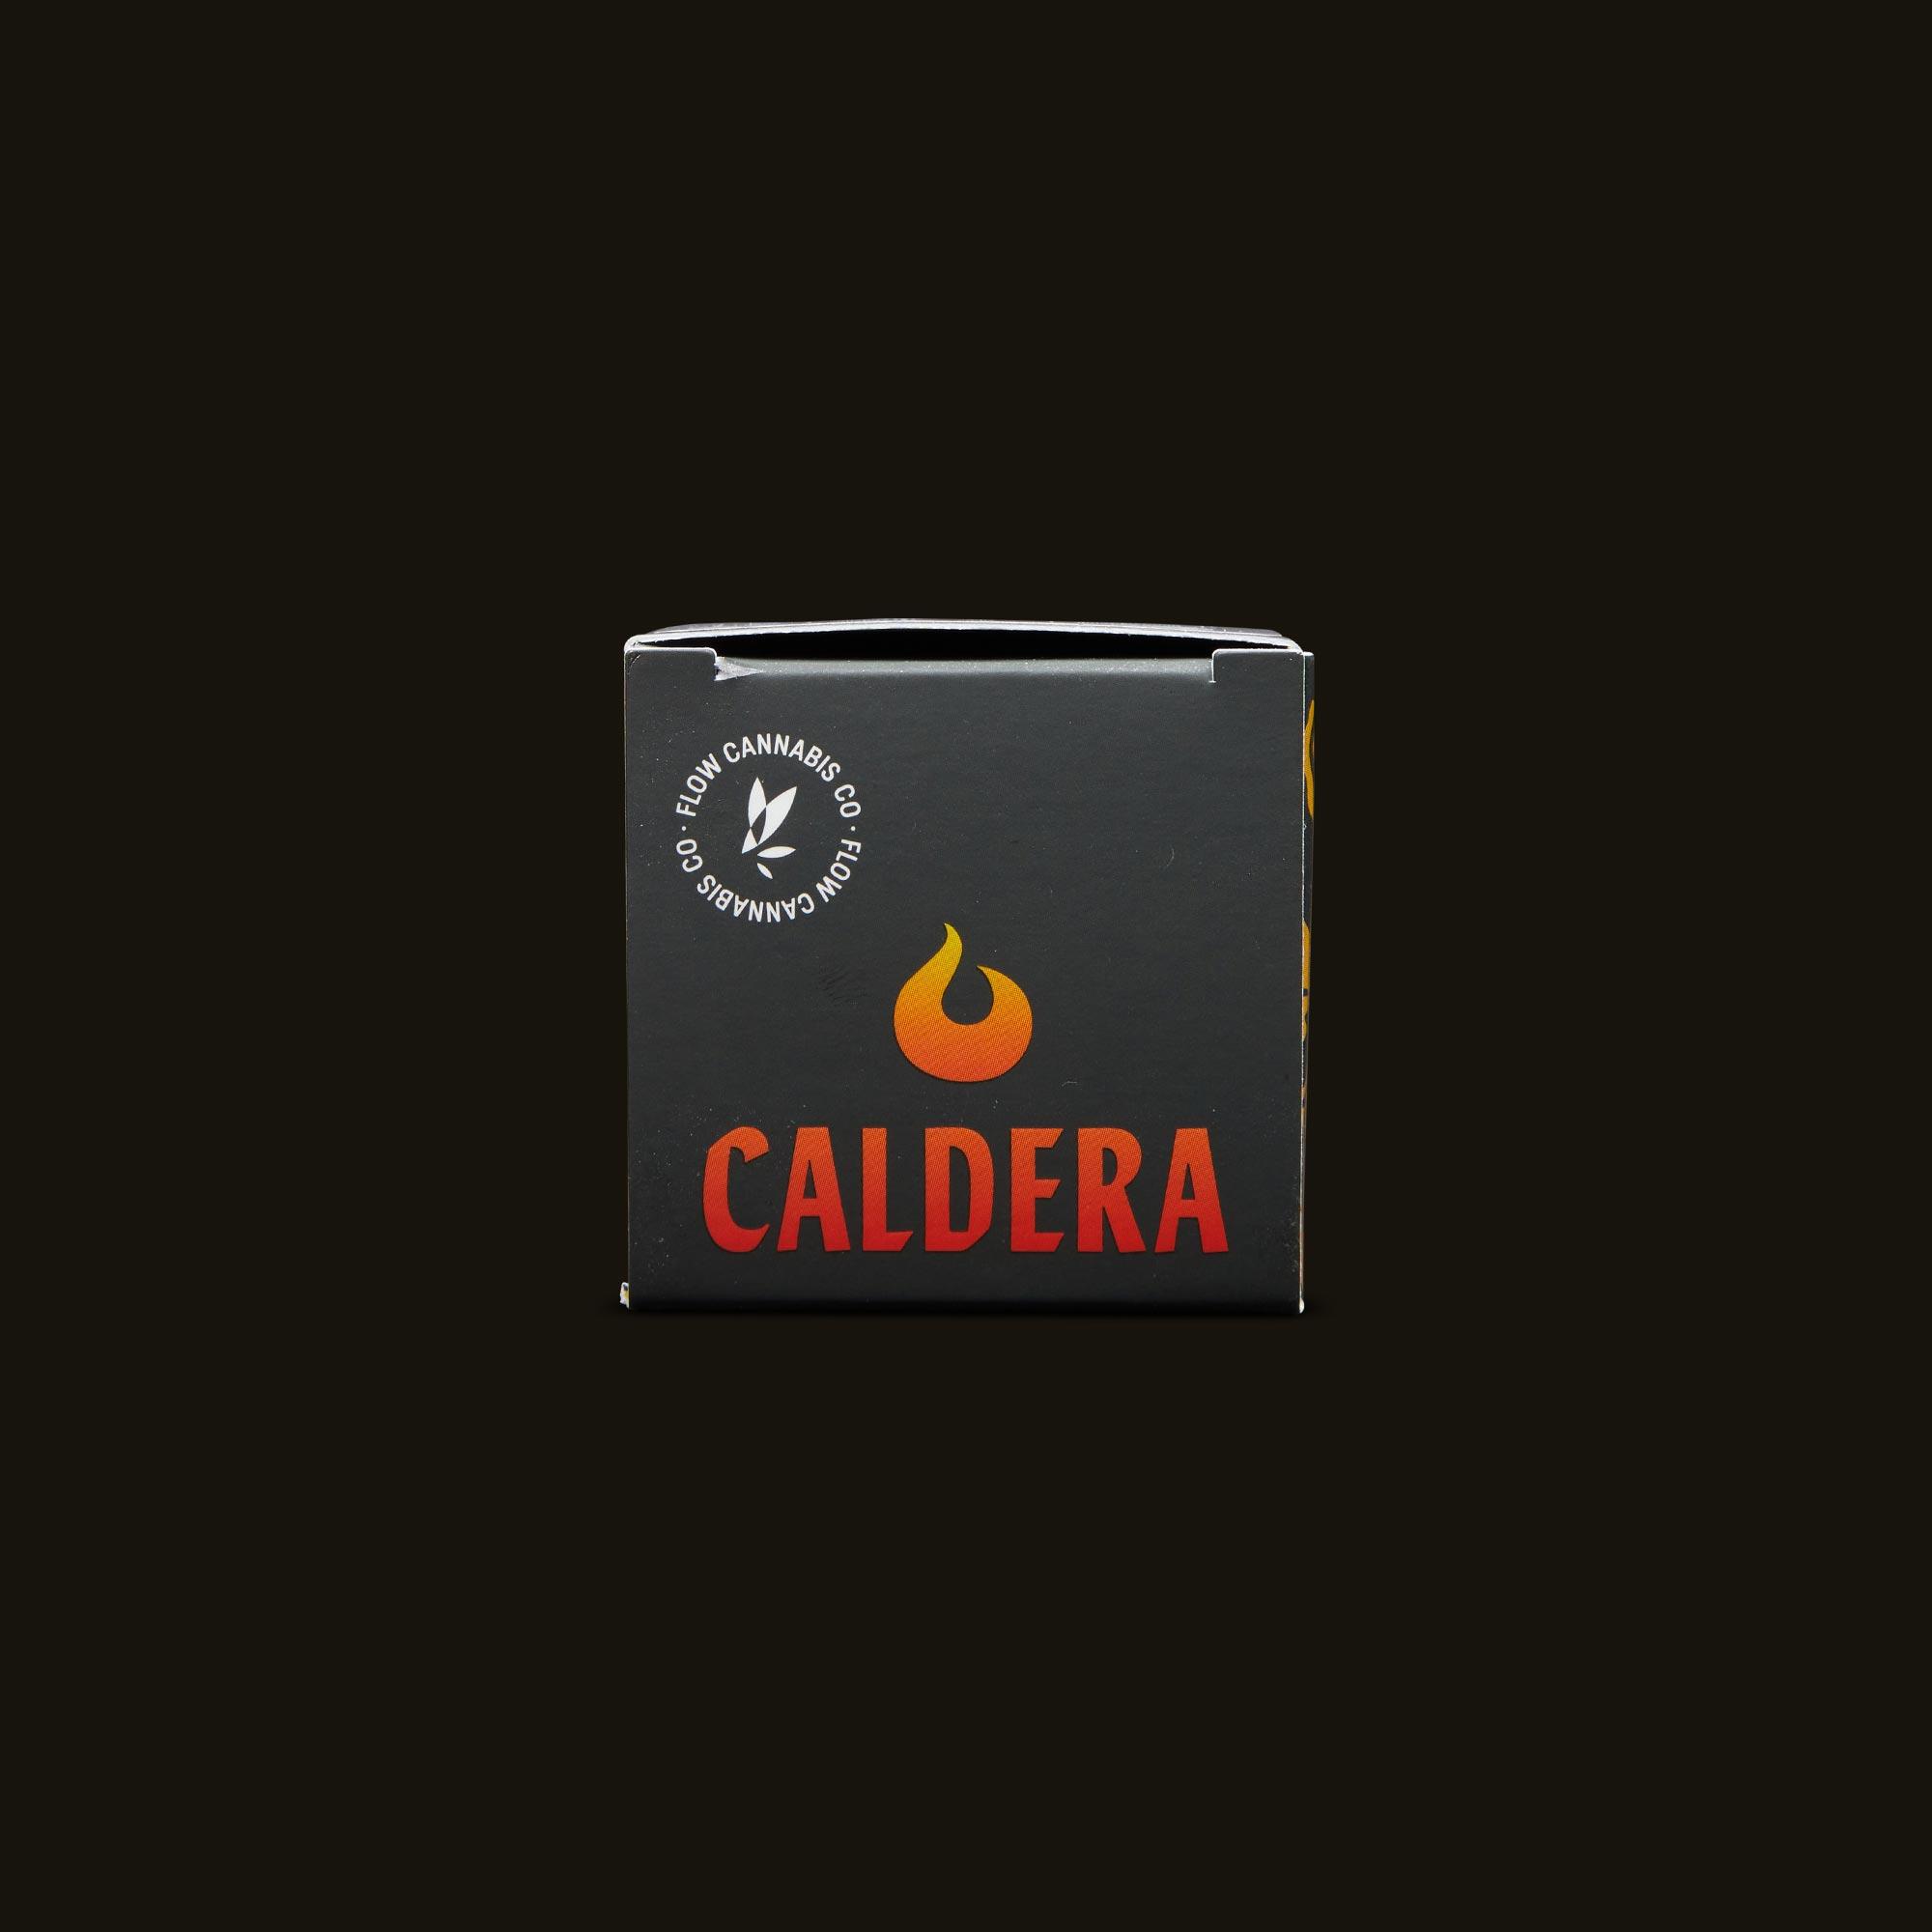 Caldera Sativa Sauce Top Packaging